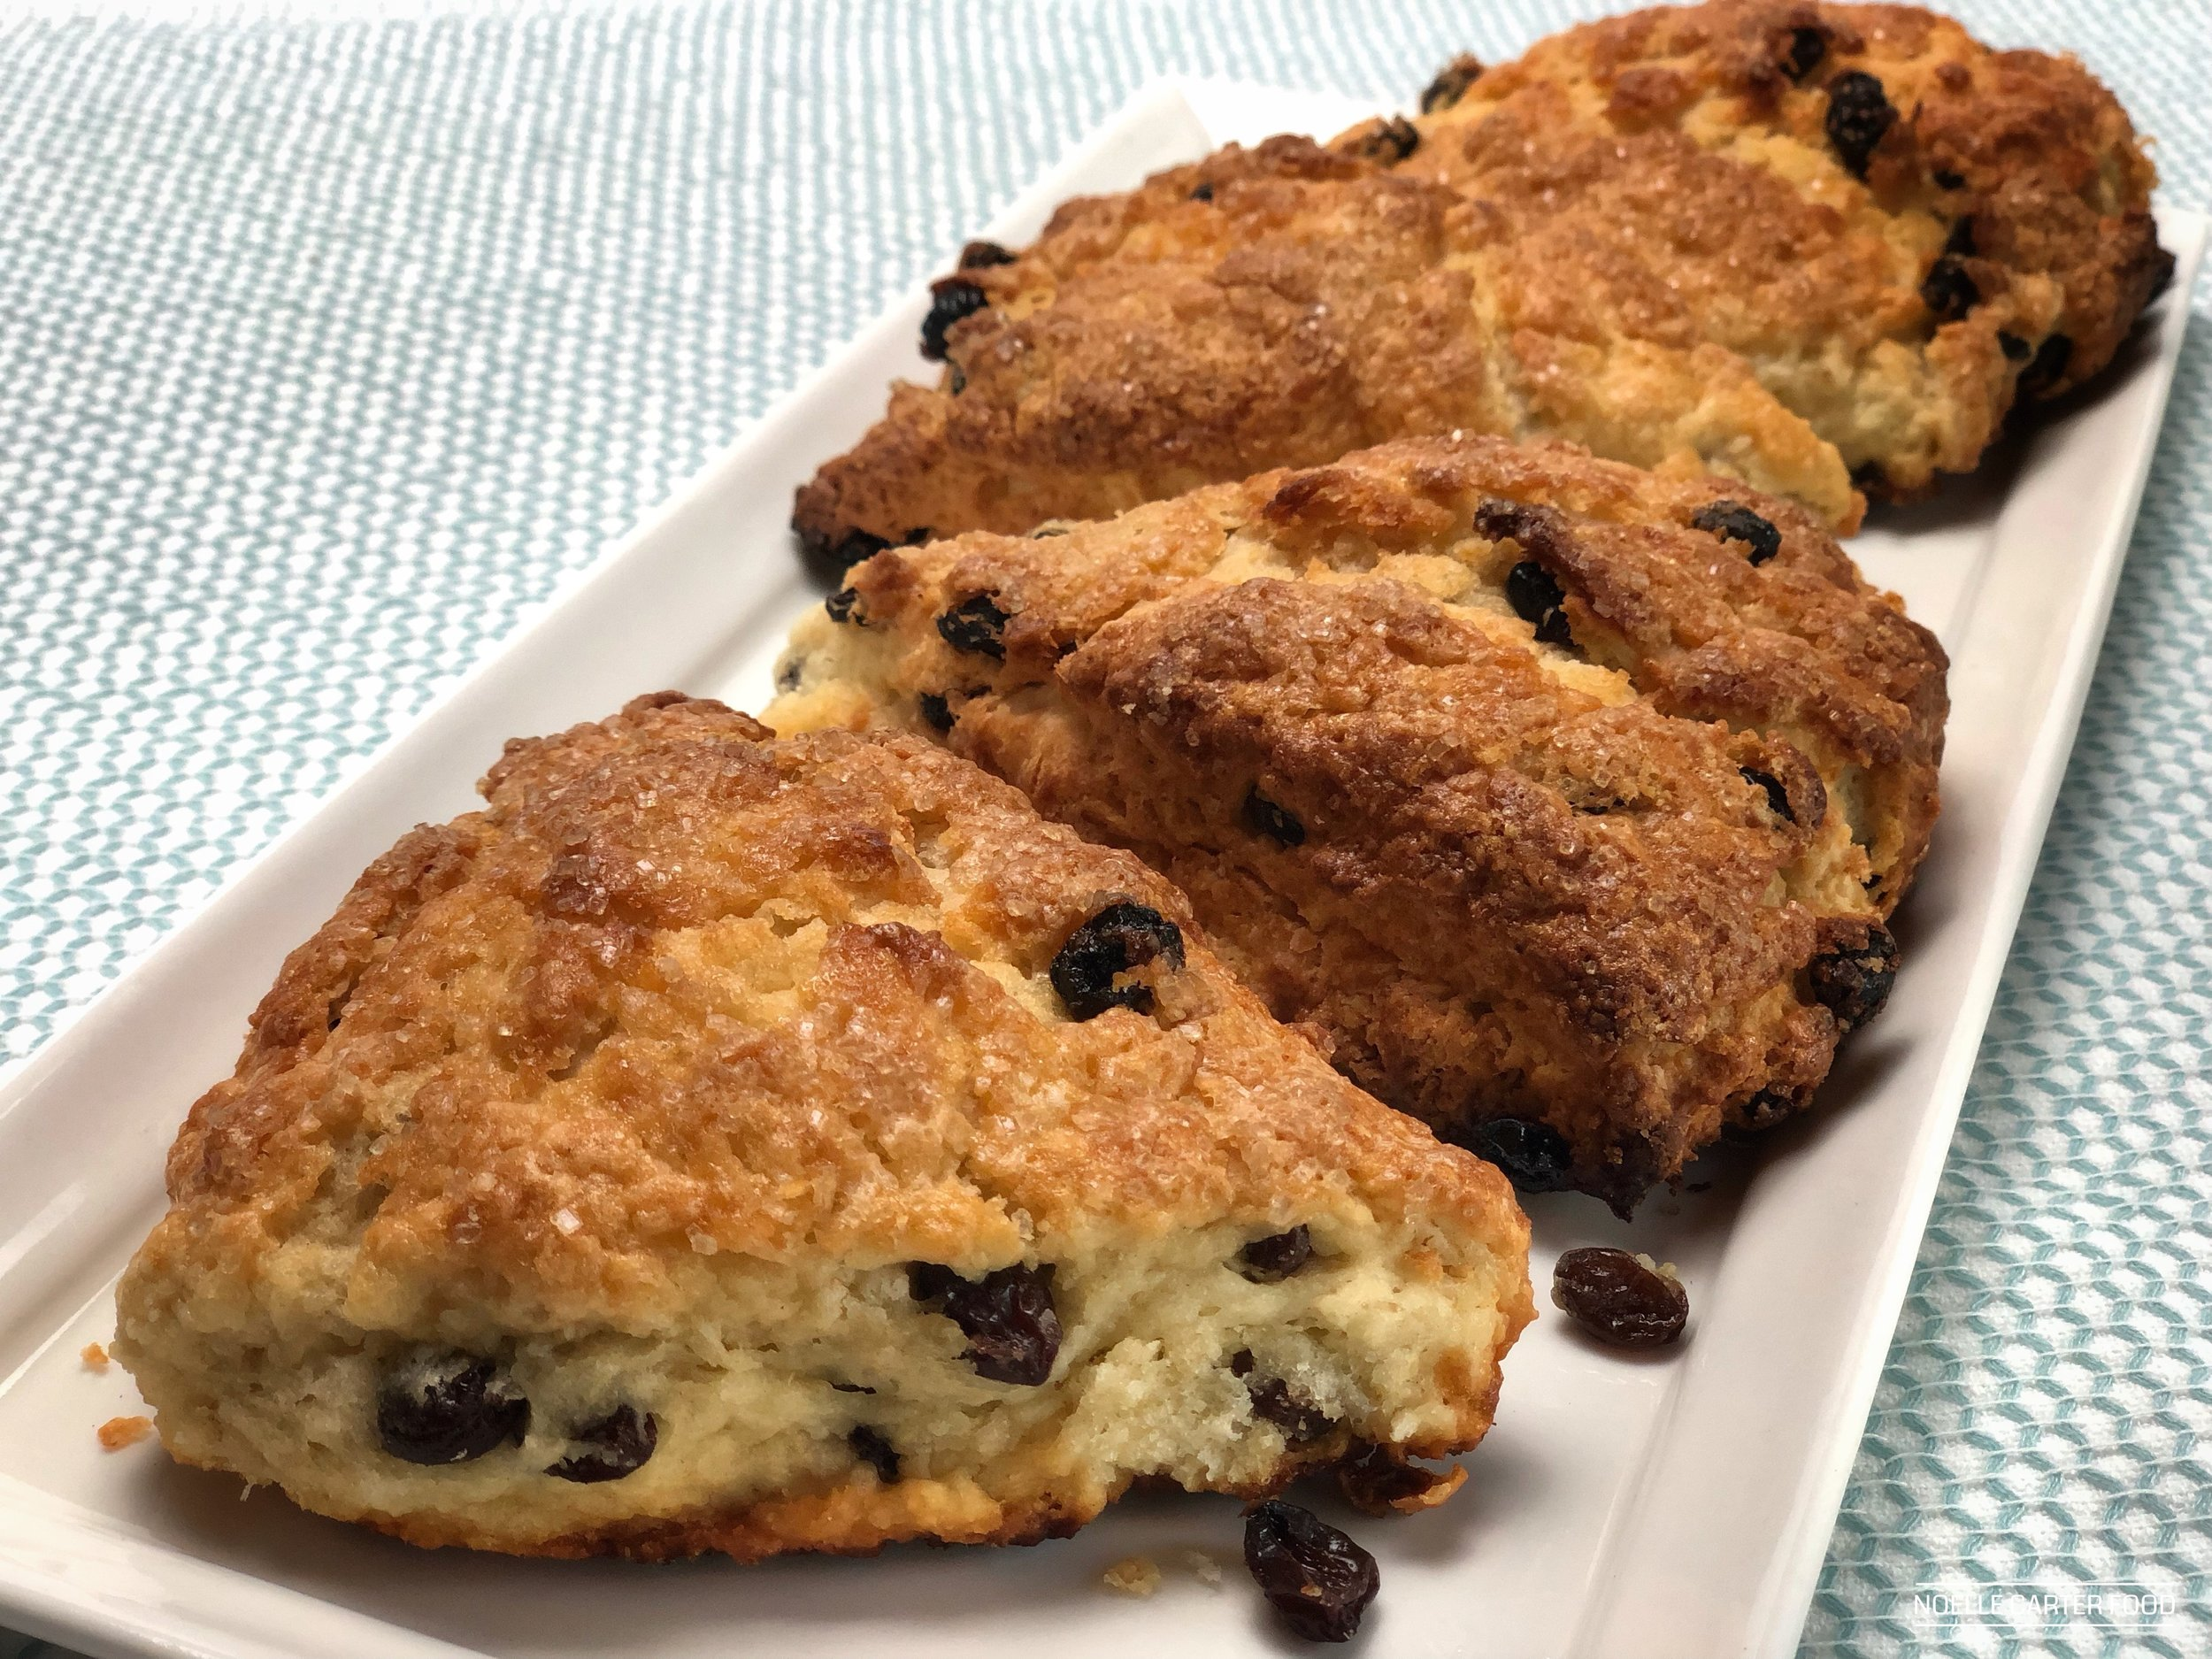 Ginger rum raisin scones. (Noelle Carter)